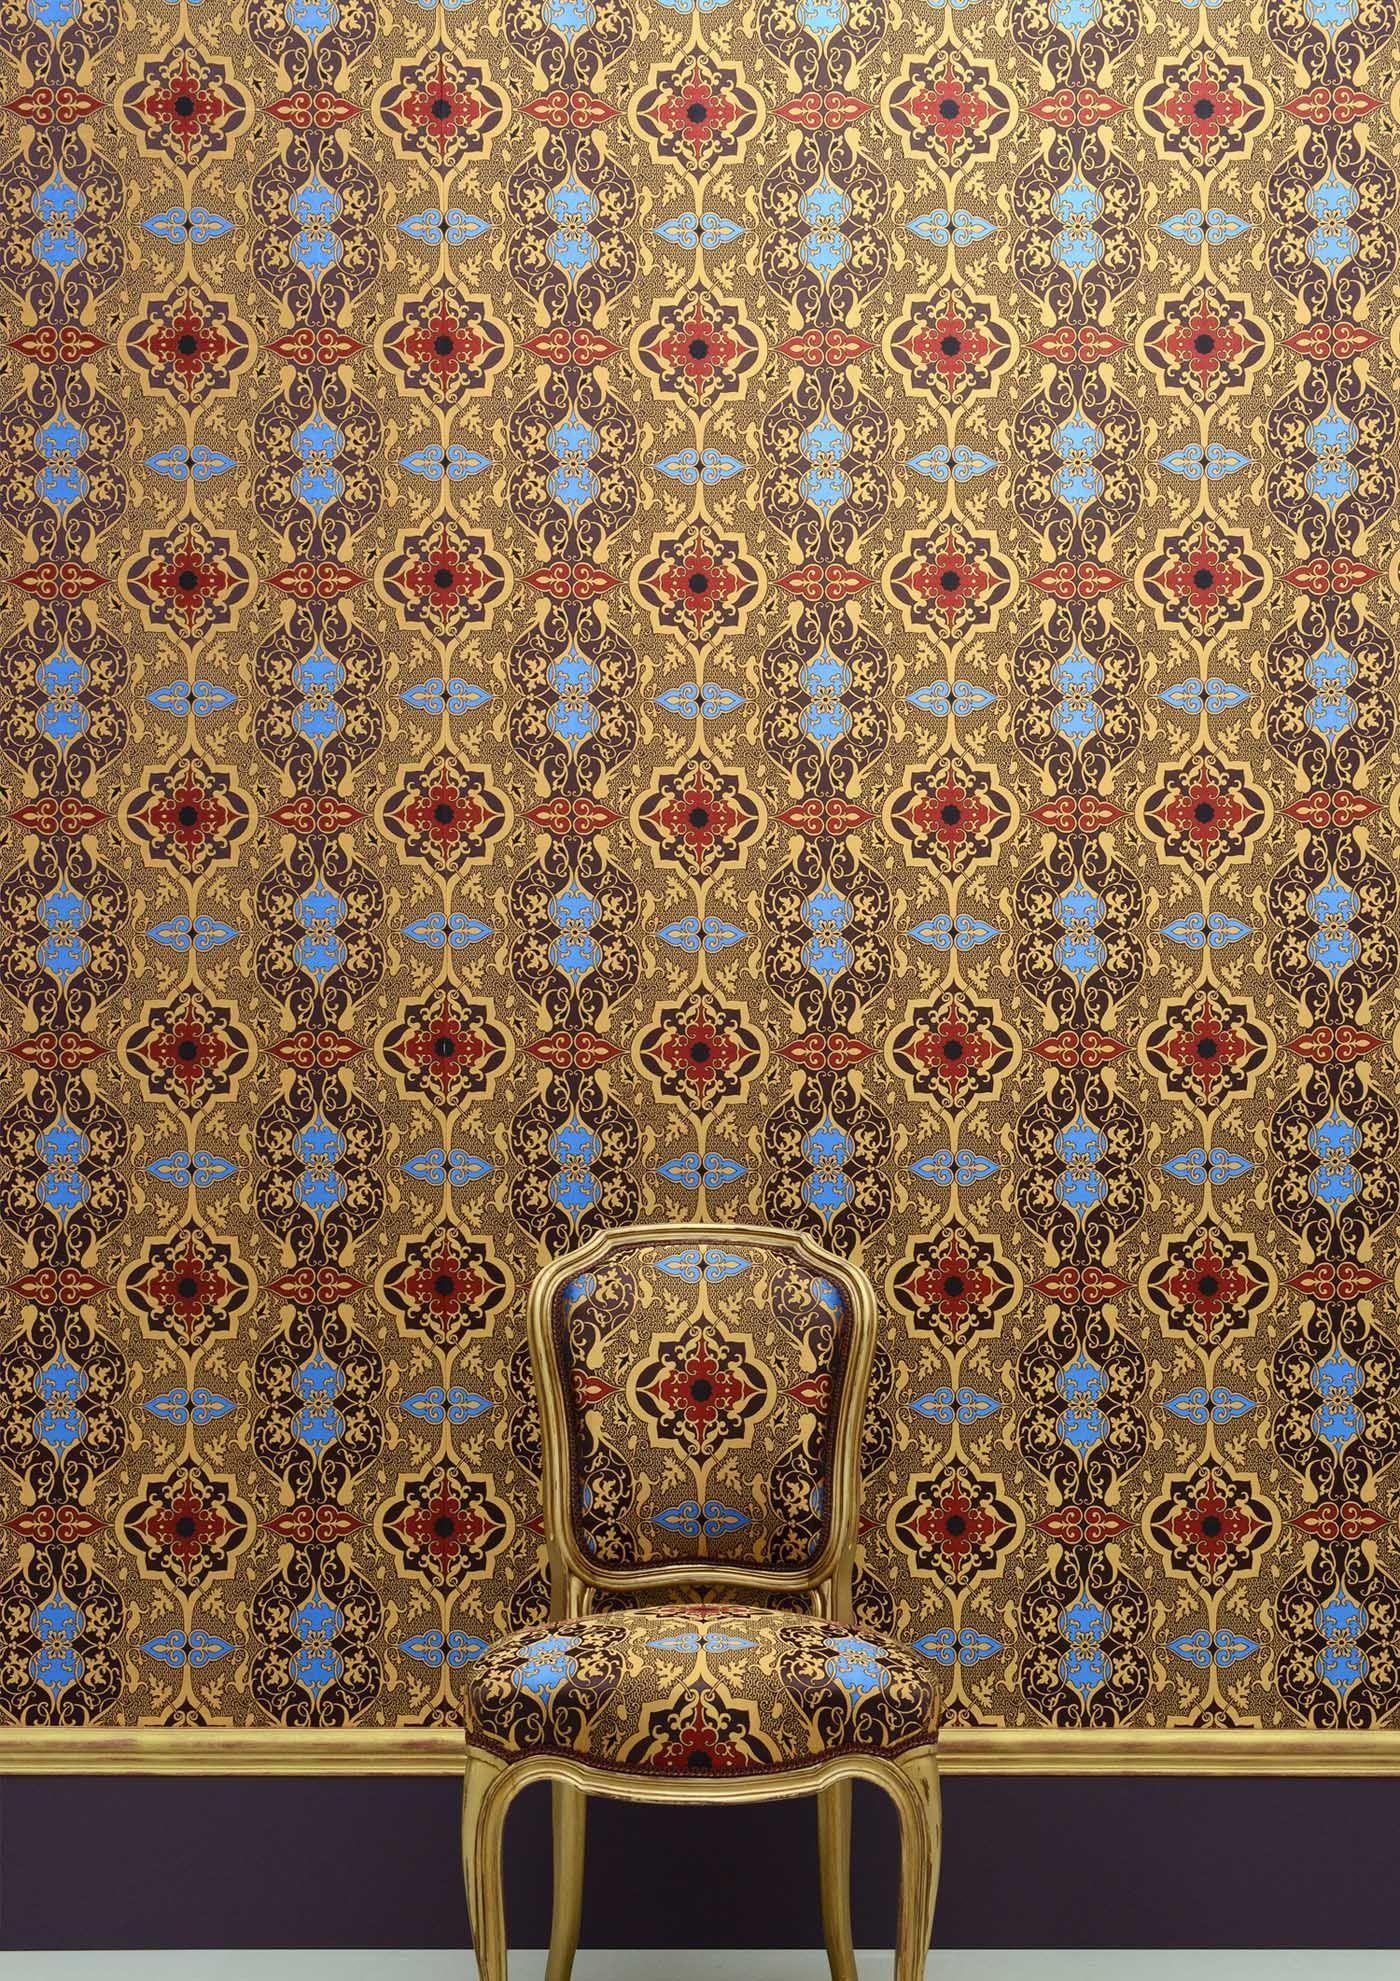 Tissu Tolede Chaise Chair Louis Xv Meubles Hummel Chatel Wallpaper Fabric